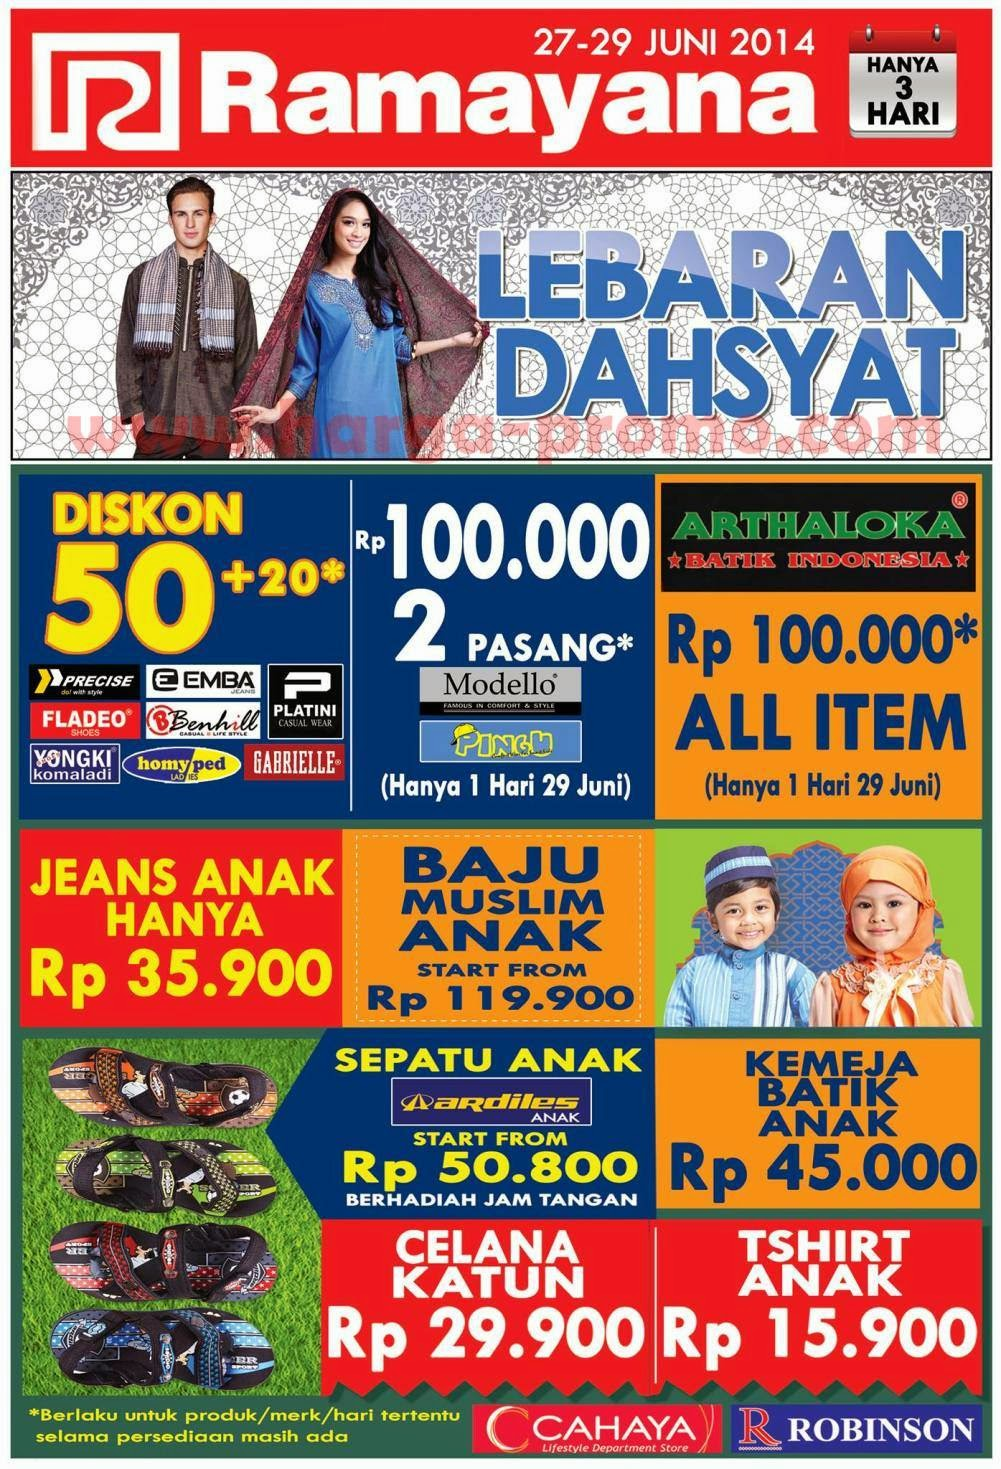 Promo RAMAYANA Department Store Akhir Pekan Periode 27 - 29 Juni 2014 ~  promosi katalog 9badd00e29